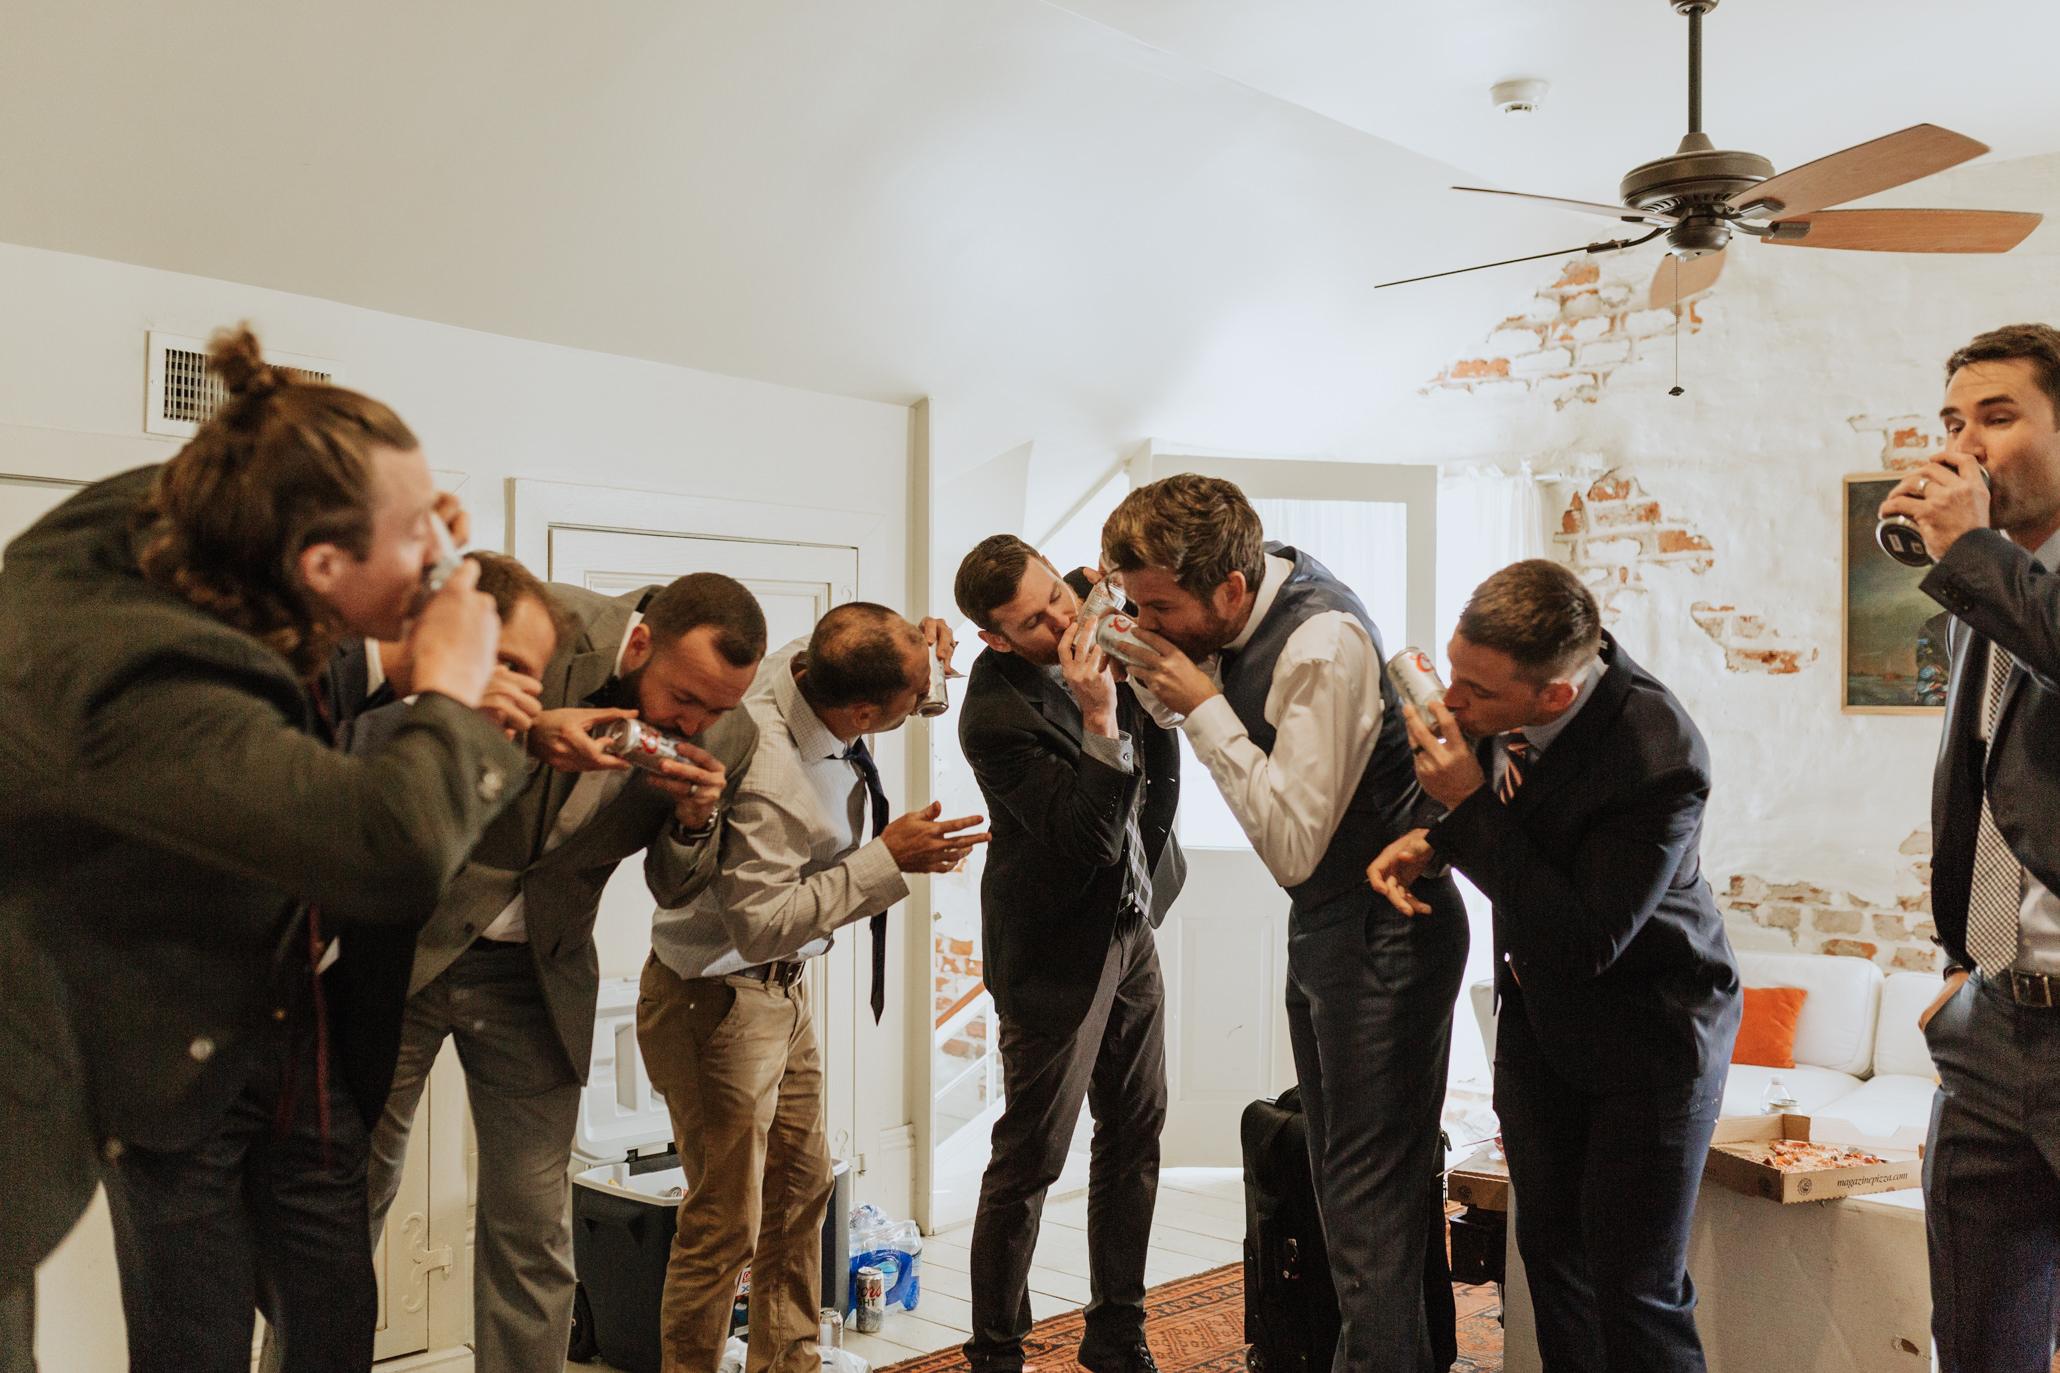 race religious wedding new orleans-22.jpg